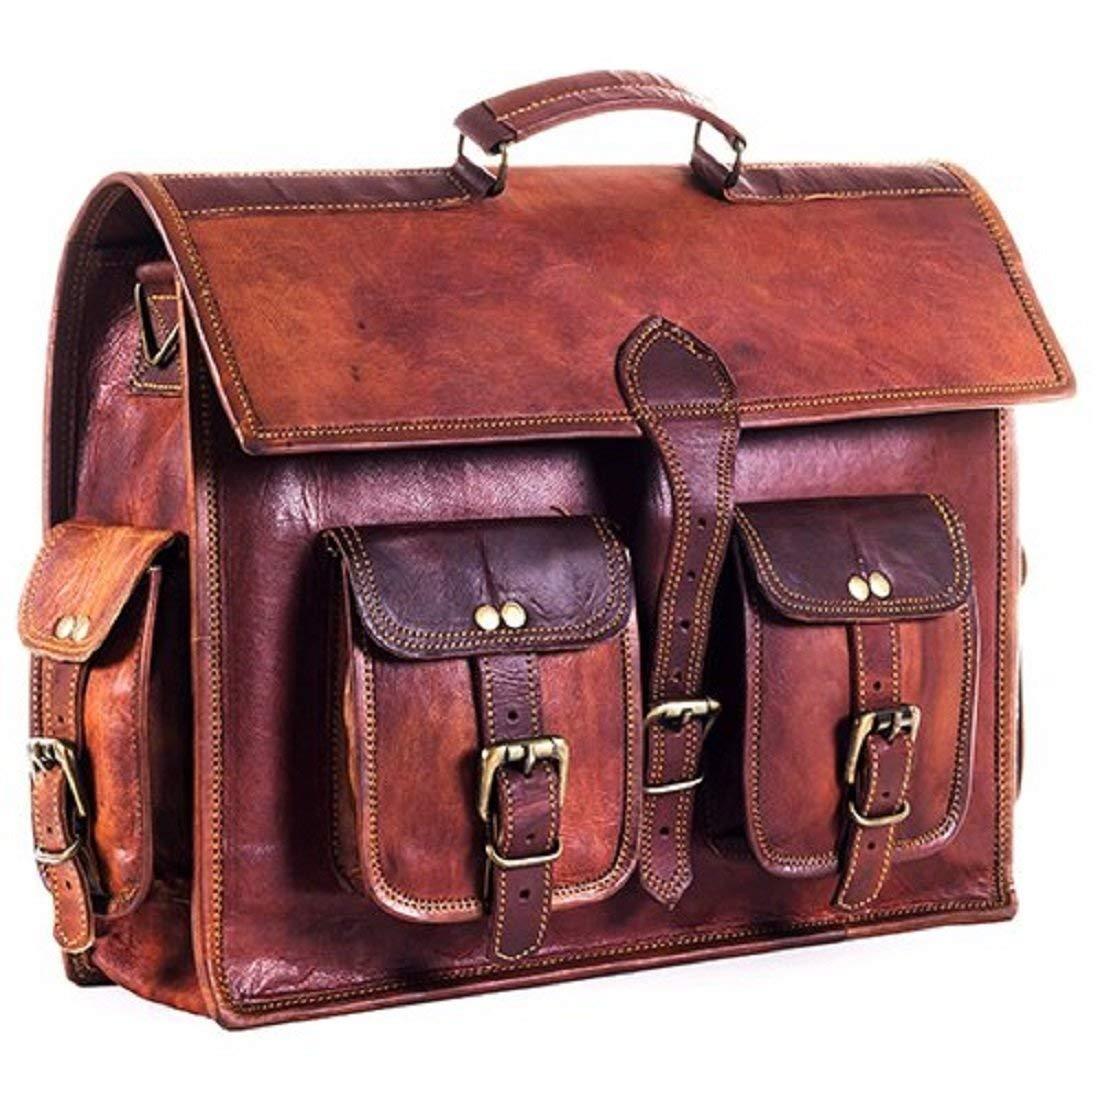 Leather Saddler Genuine Leather handmade laptop notebook messenger bag Size 15x11